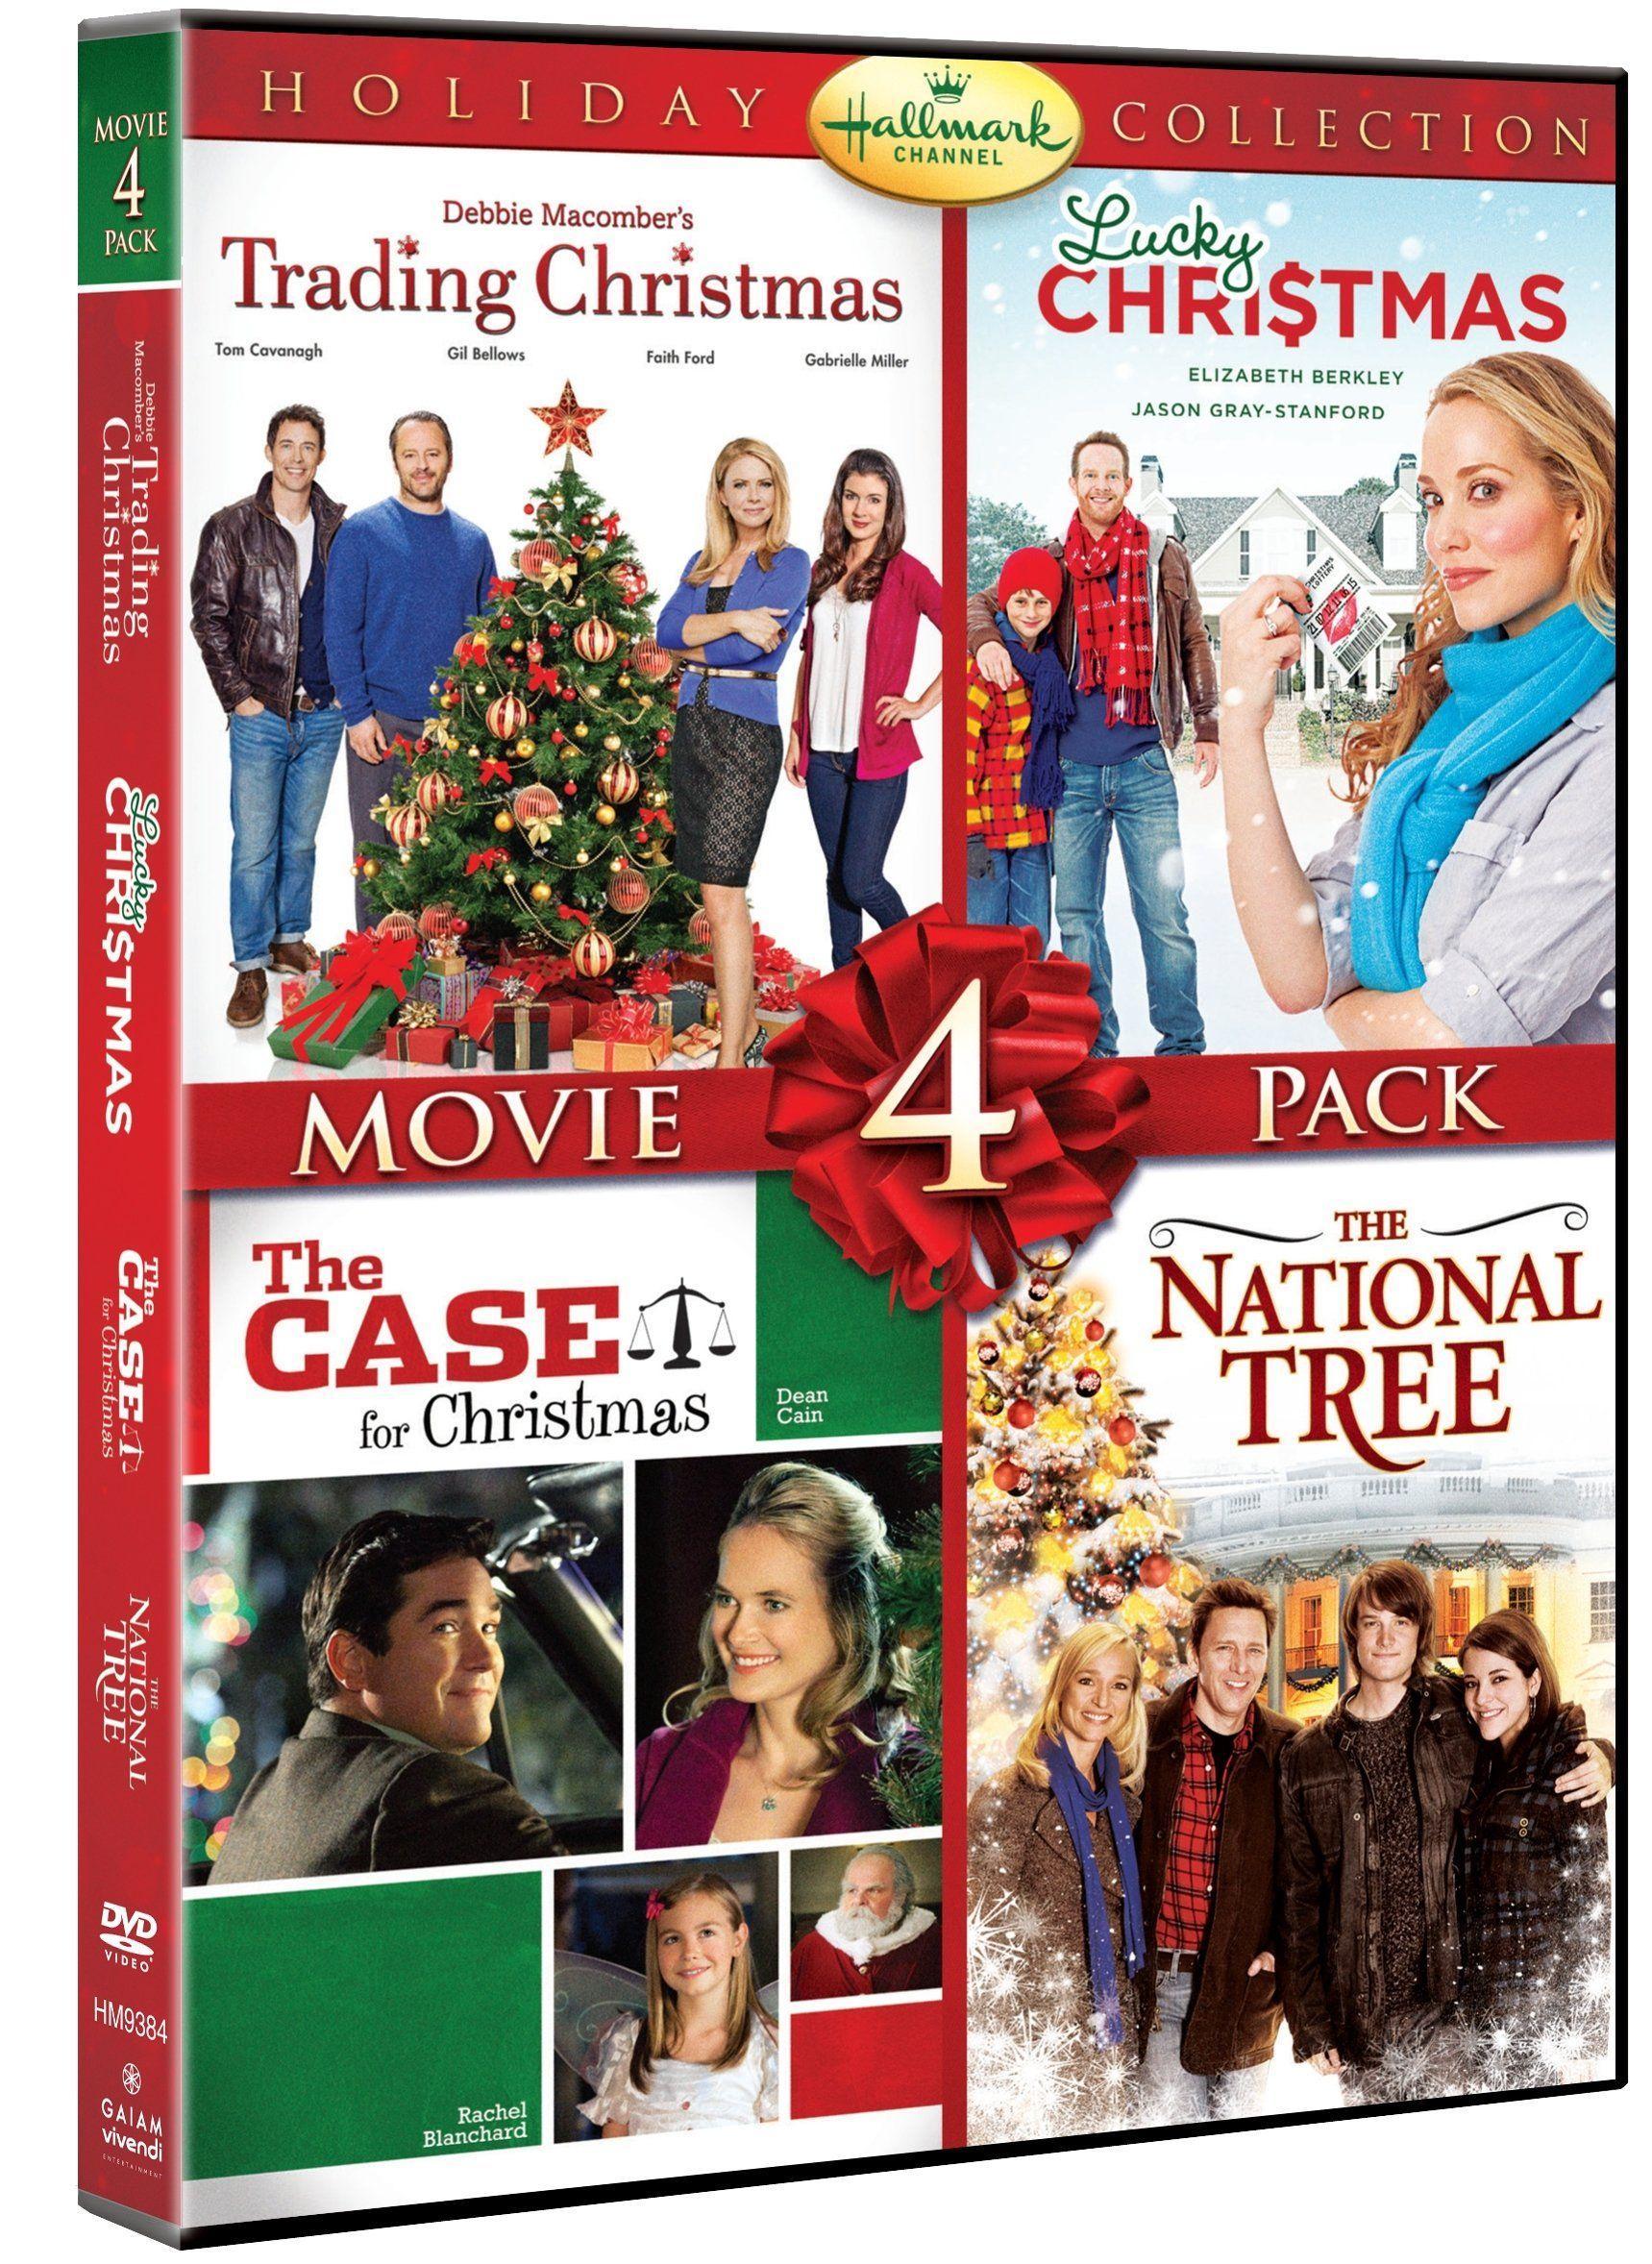 hallmark holiday collection movie pack trading jpg 1719x2356 trading christmas hallmark movie - Debbie Macomber Trading Christmas